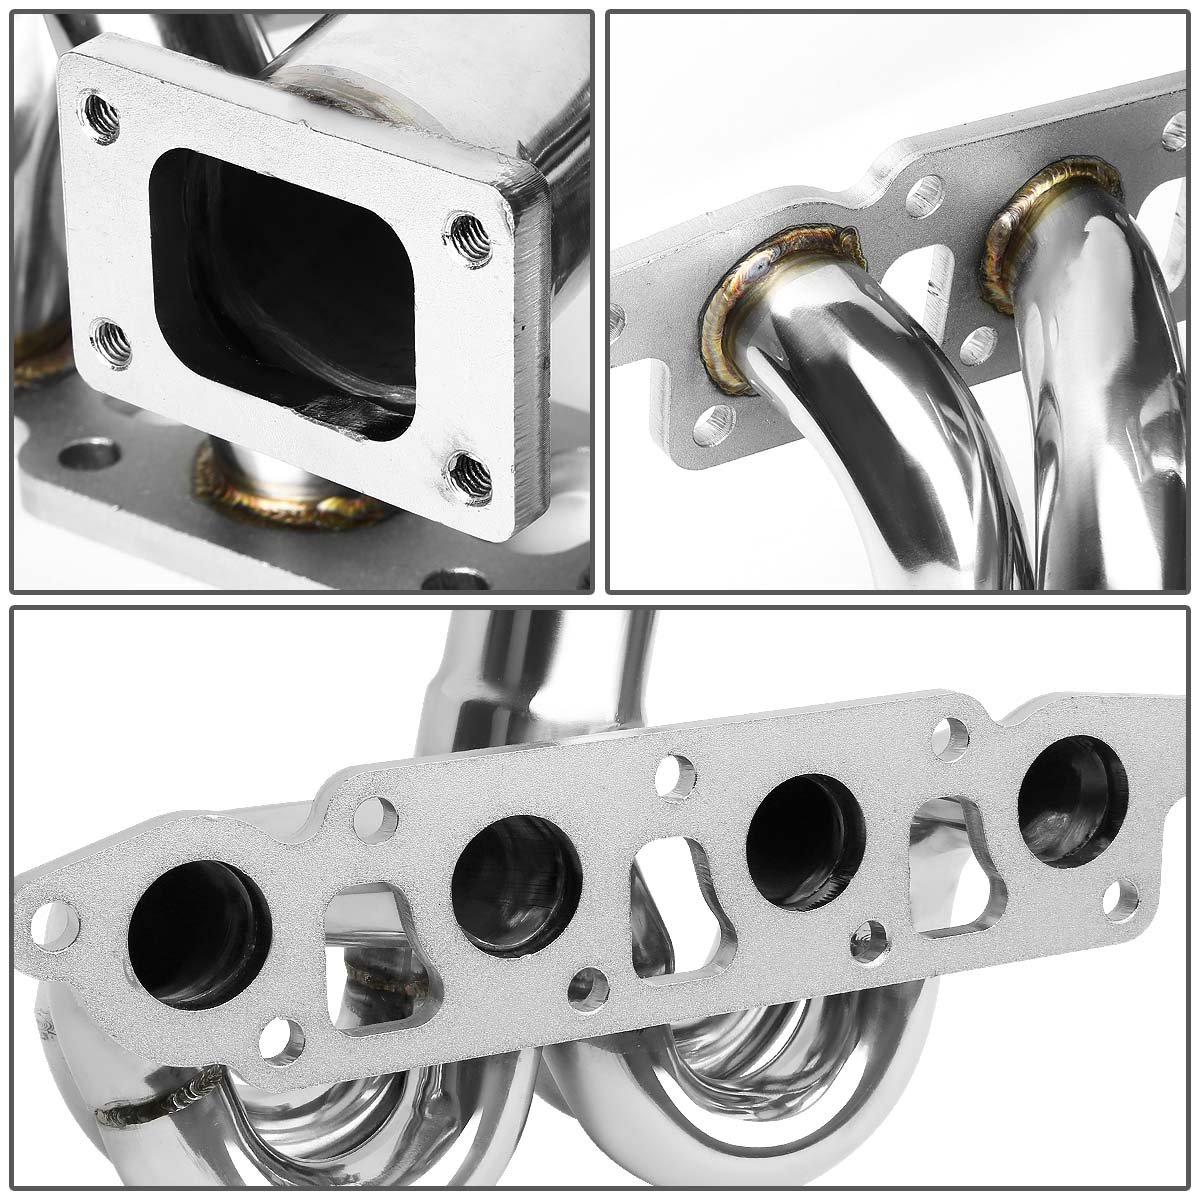 DNA MOTORING TM-RB26-S-T Stainless Steel Turbo Manifold